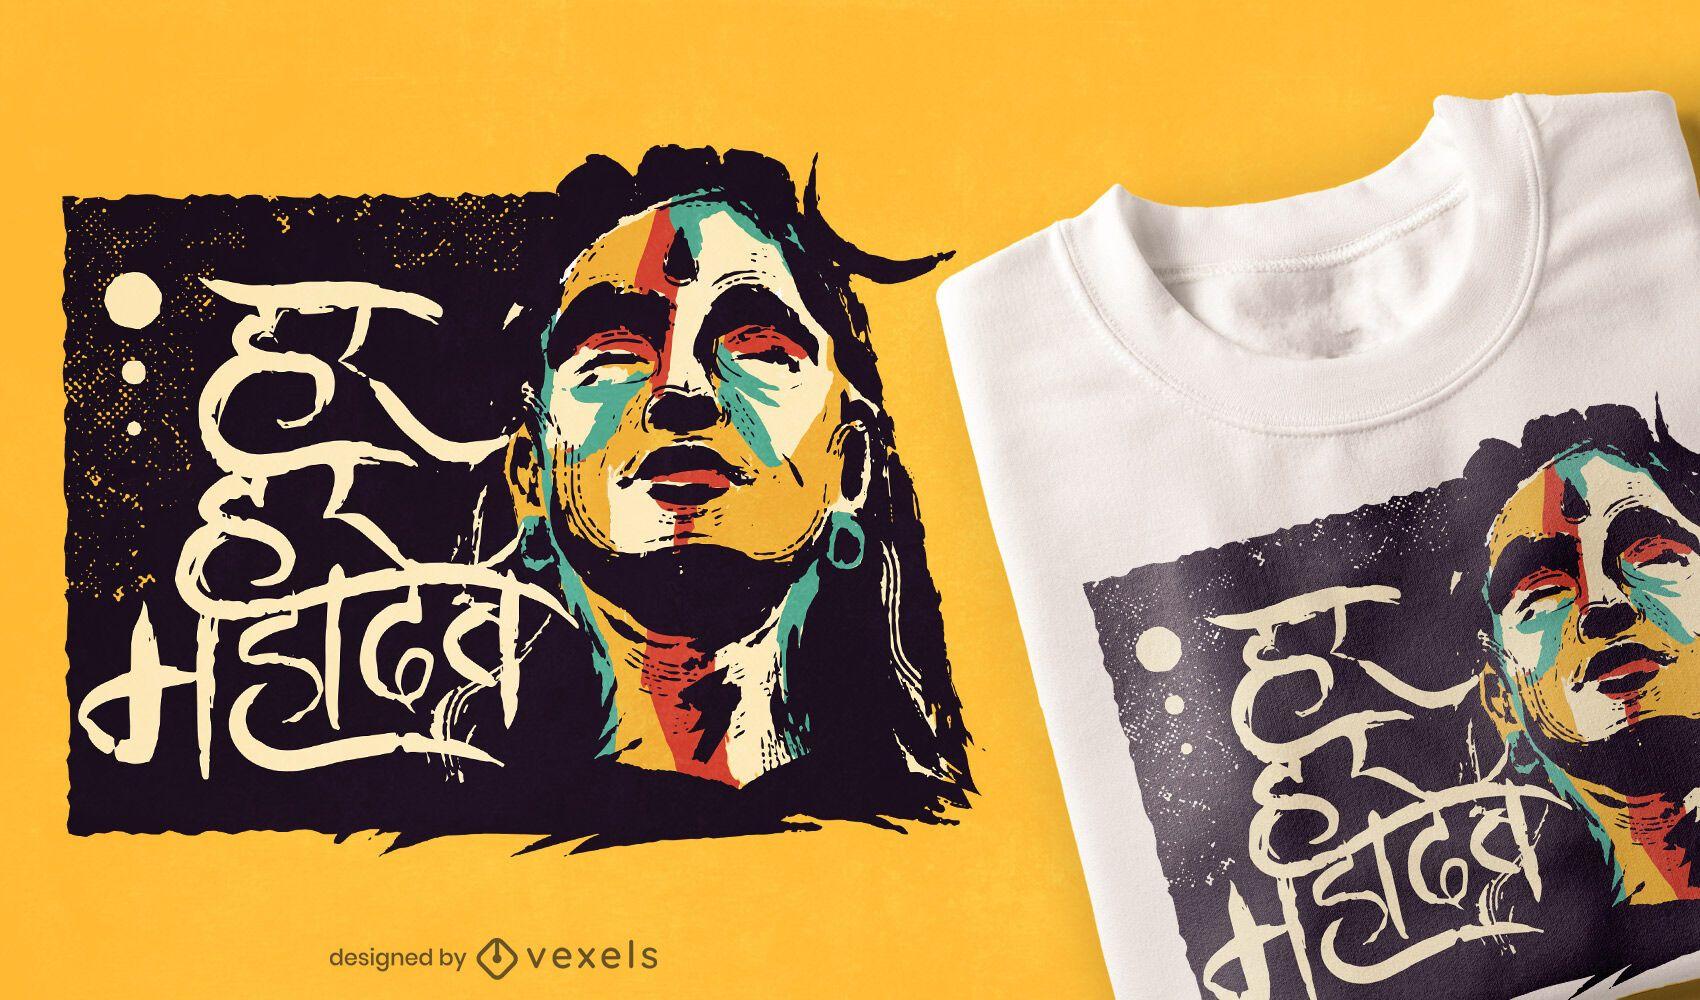 Diseño de camiseta de la cultura hindú de Shiva.